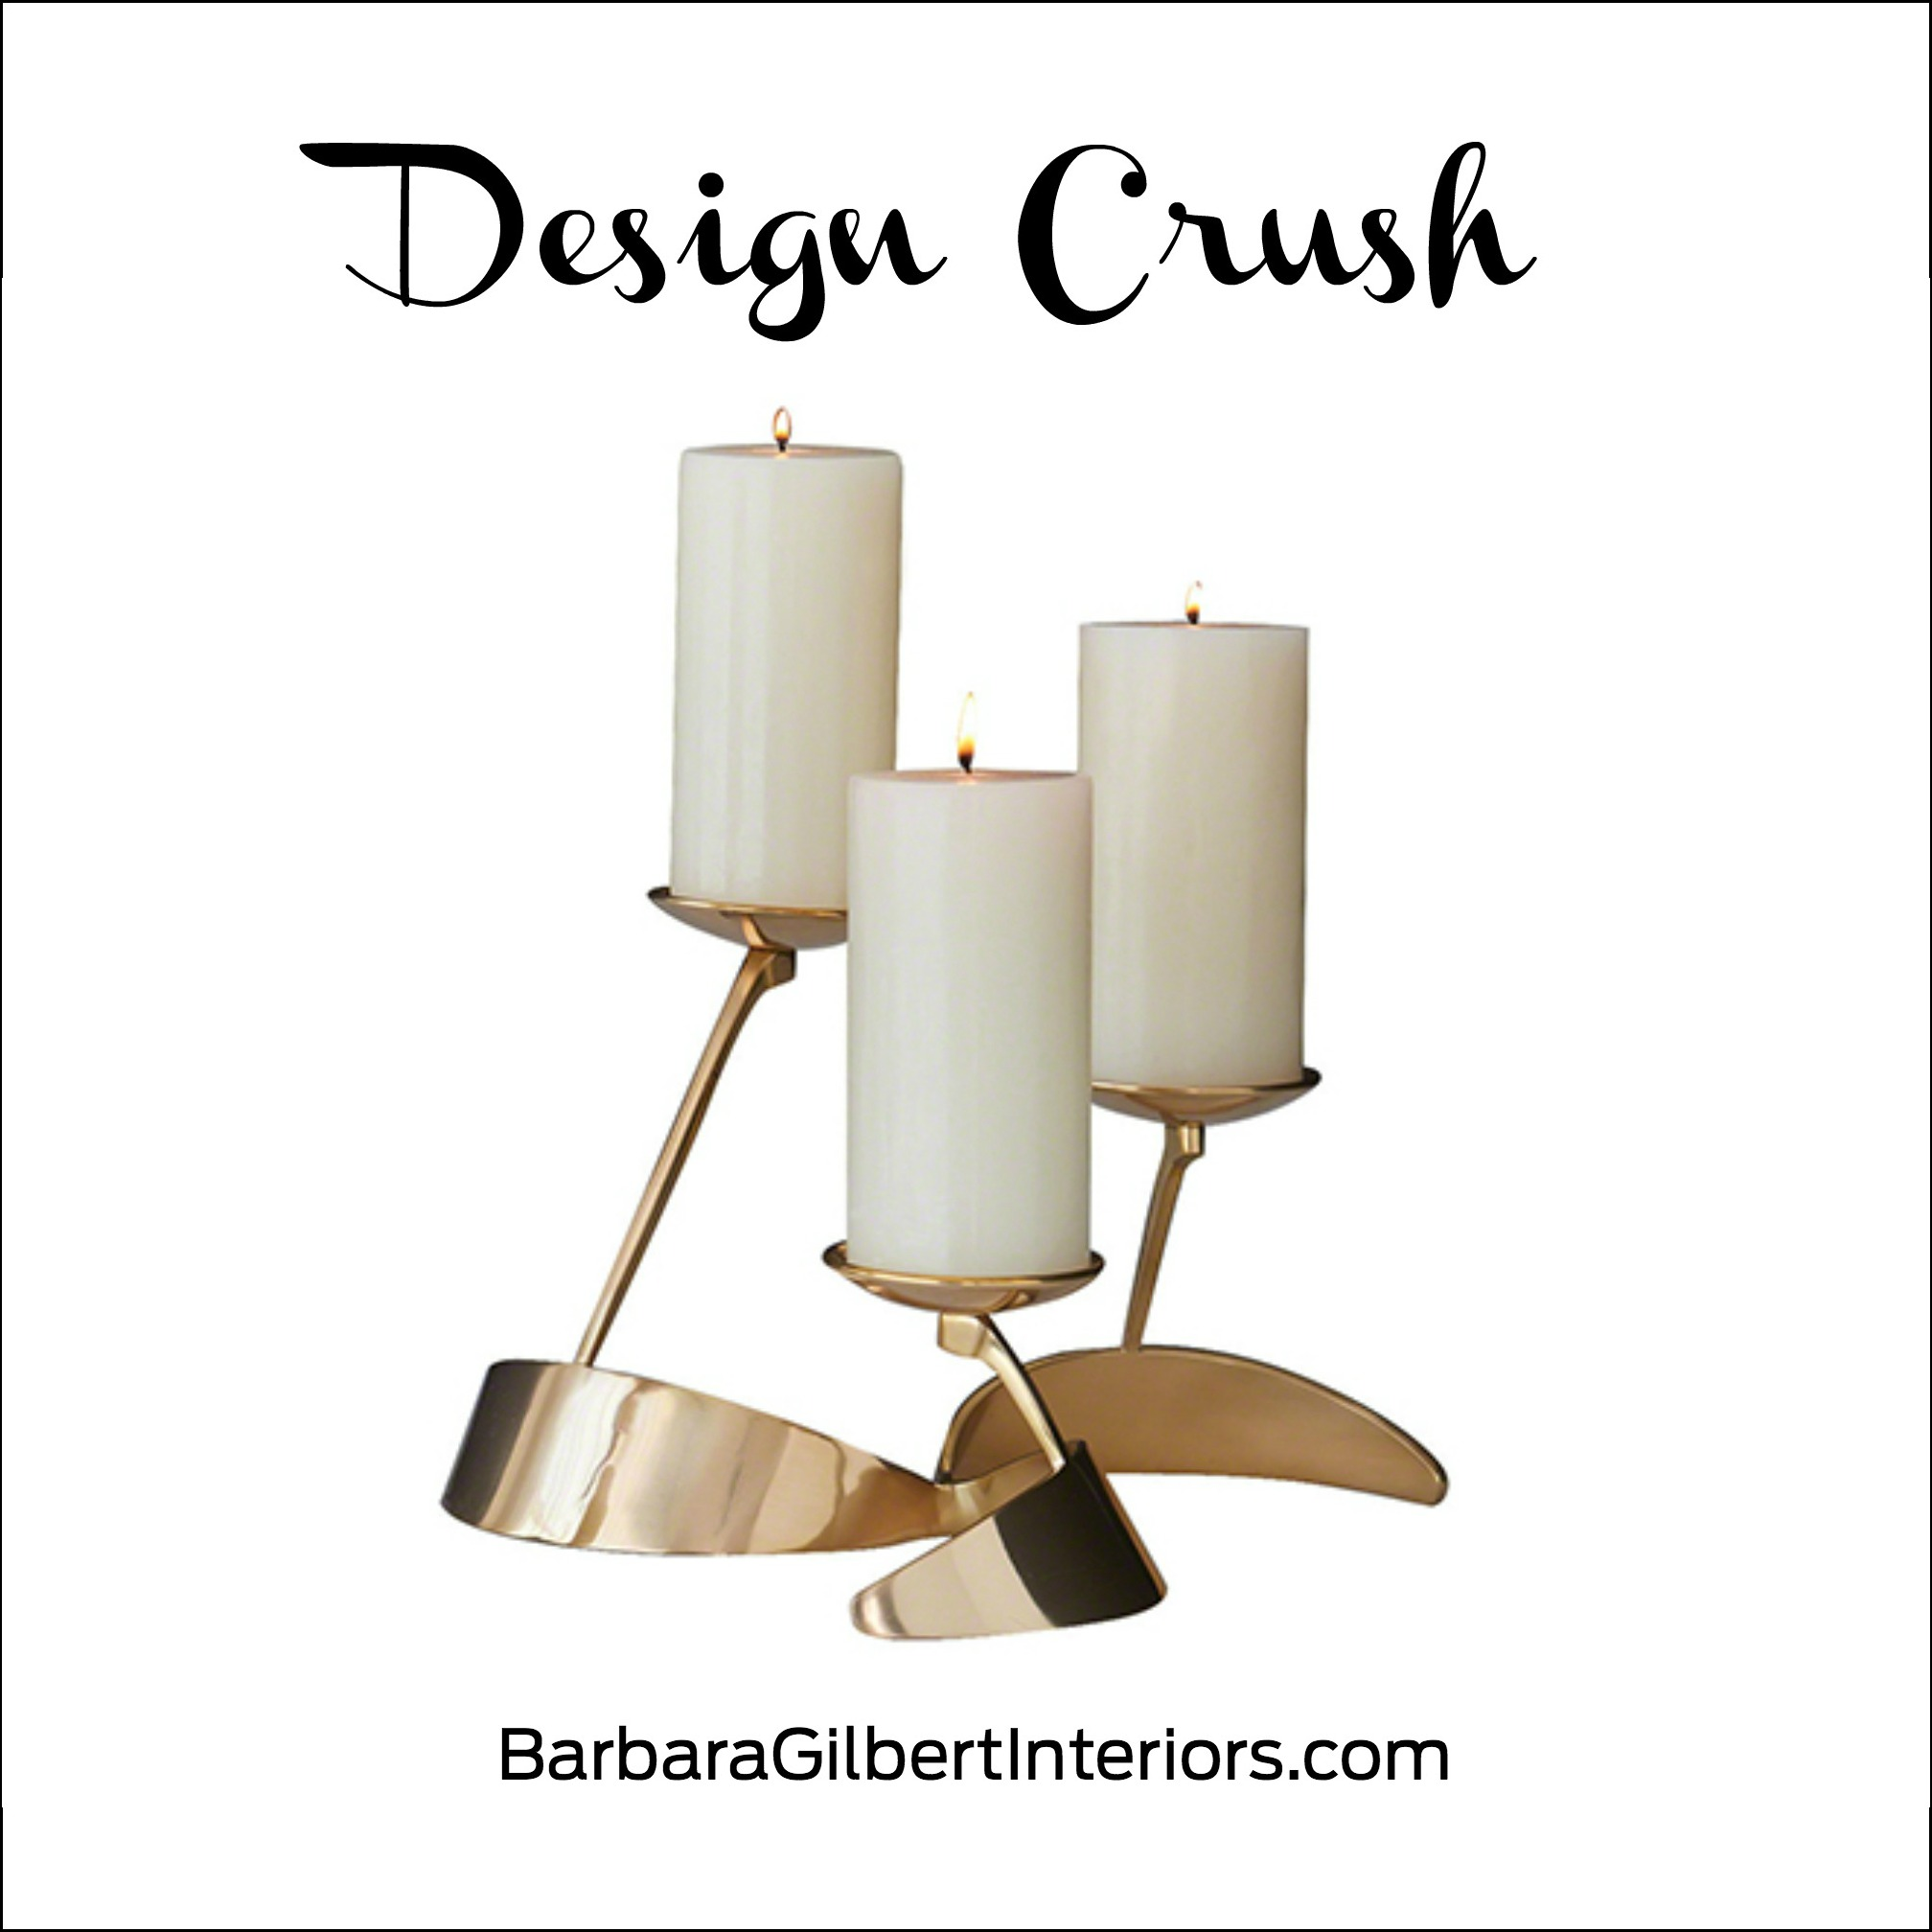 Design Crush: Pinwheel Candleholder | Interior Design Dallas | Barbara Gilbert Interiors